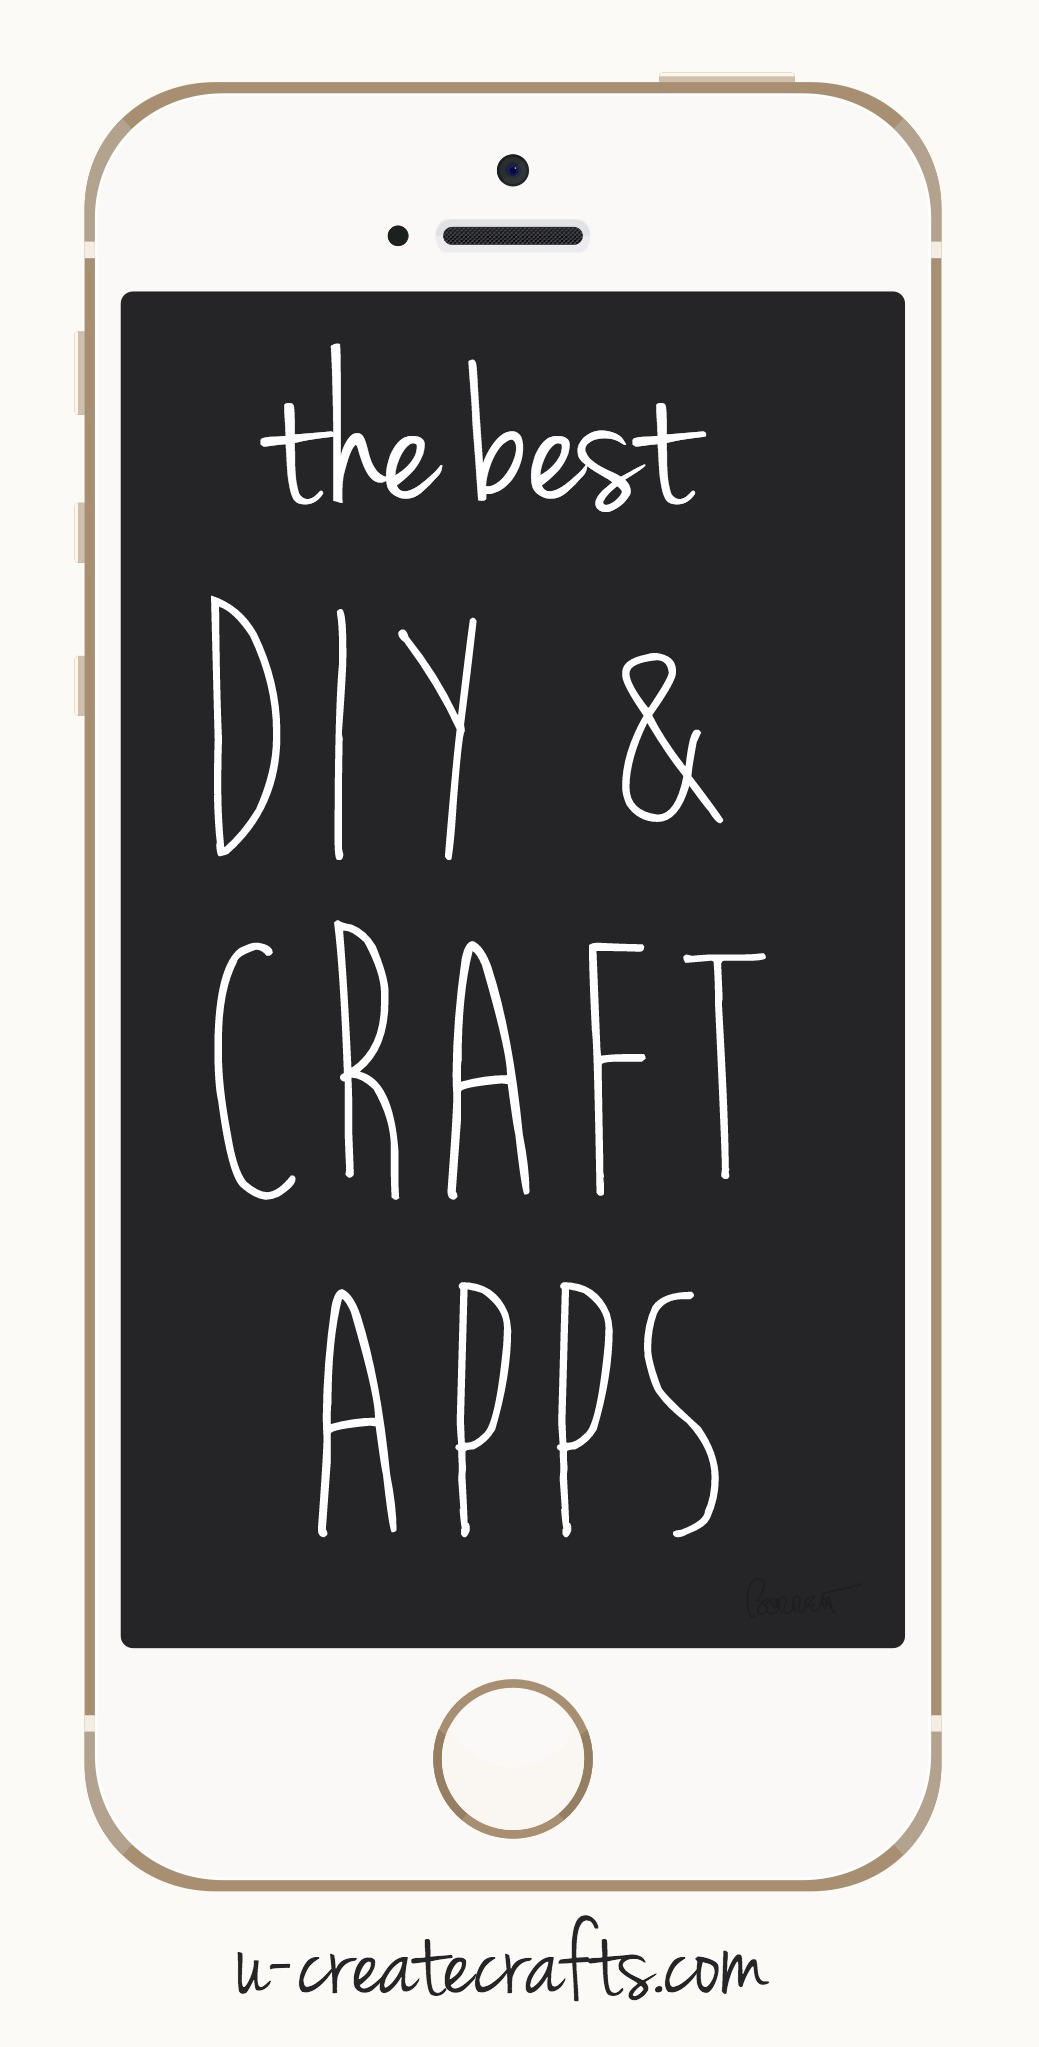 The Best DIY & Craft Apps - u-createcrafts.com